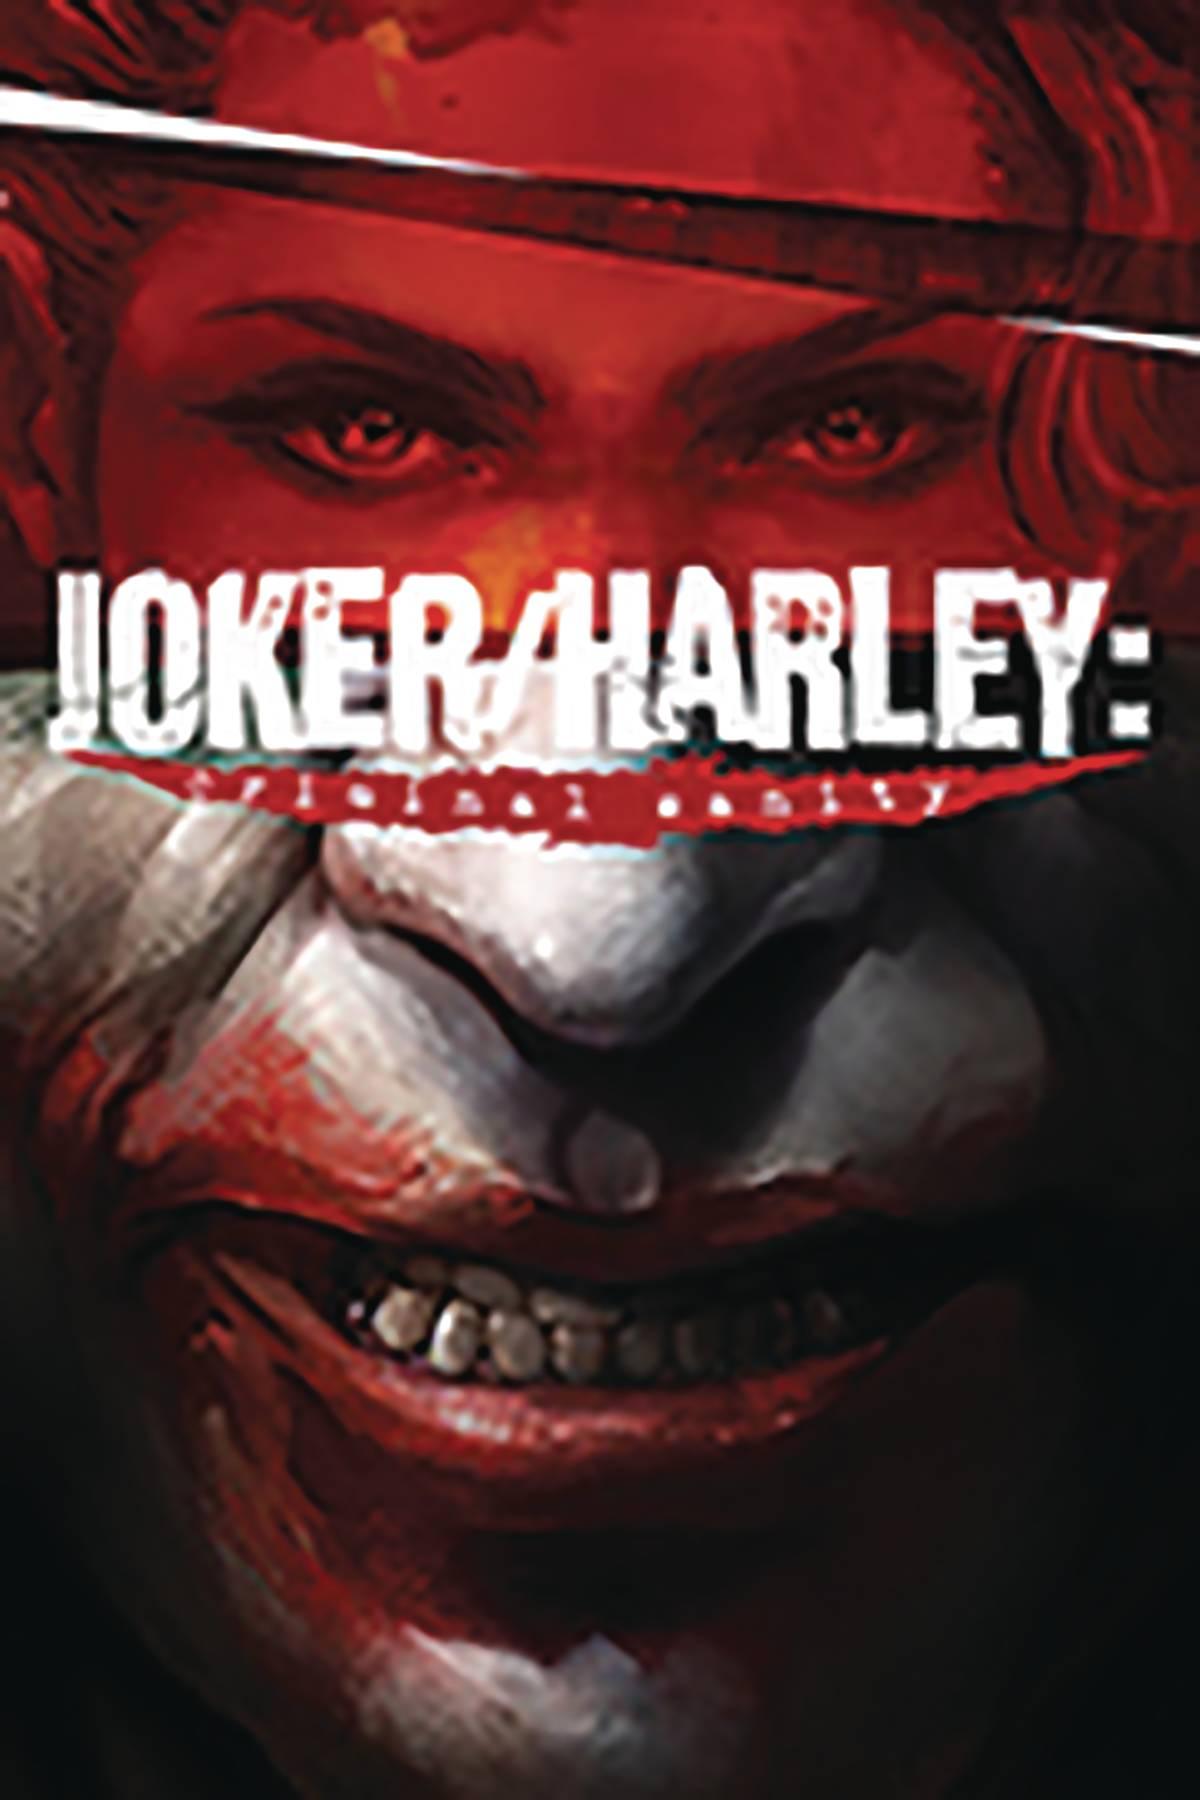 JOKER HARLEY CRIMINAL SANITY #1